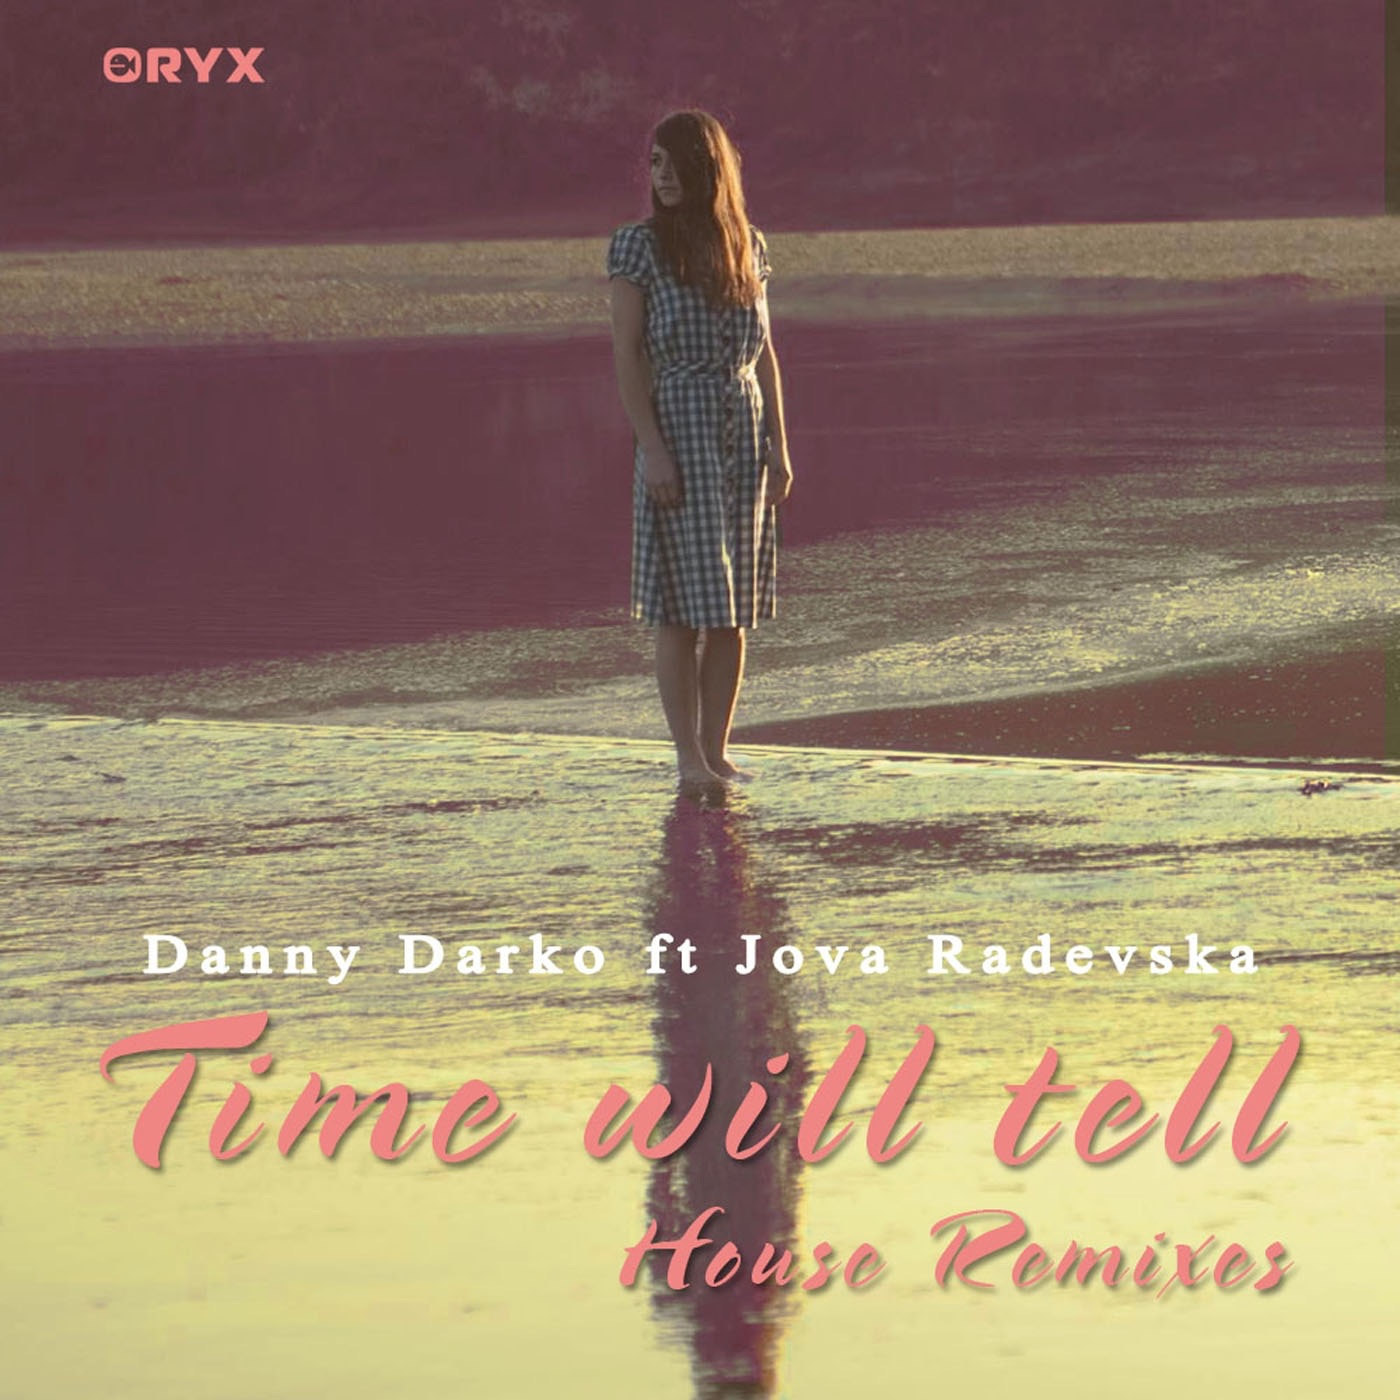 Time Will Tell House Remixes Pt. 4 (feat. Jova Radevska) - Single